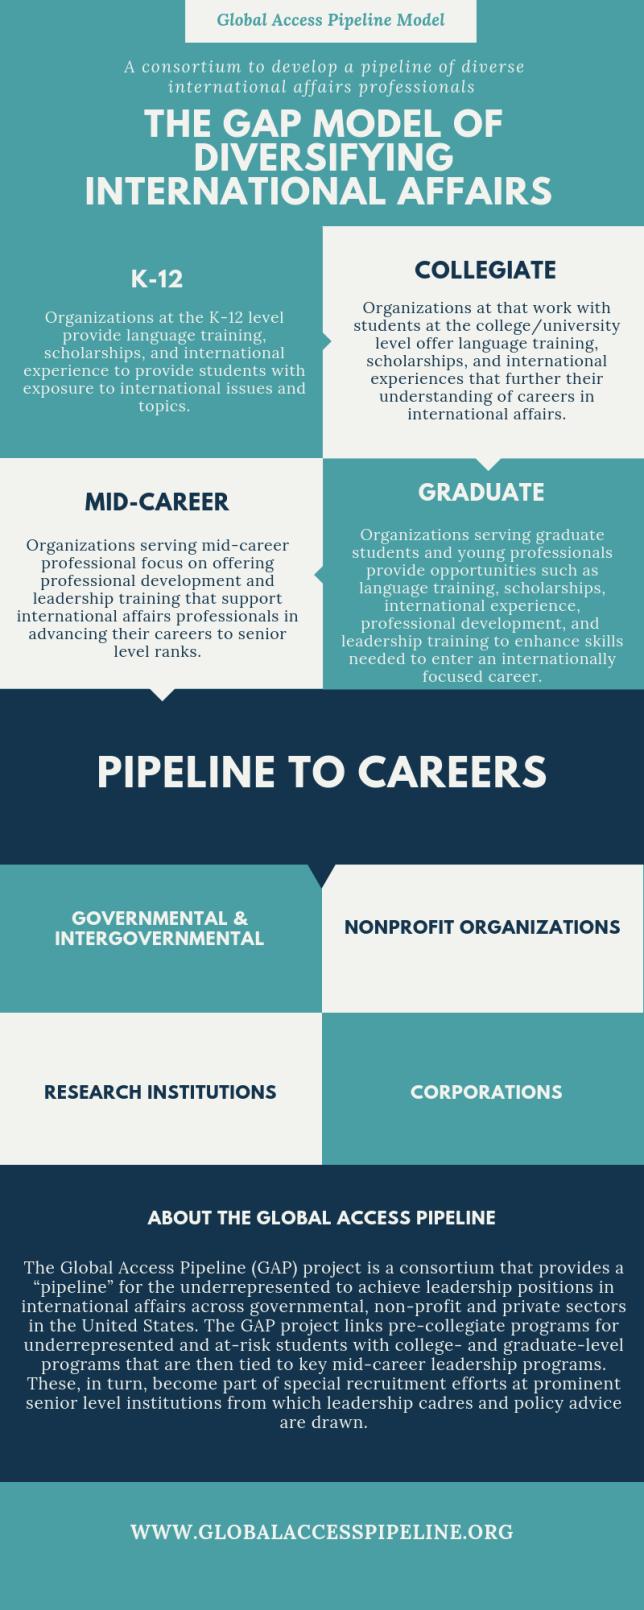 Global Access Pipeline Model